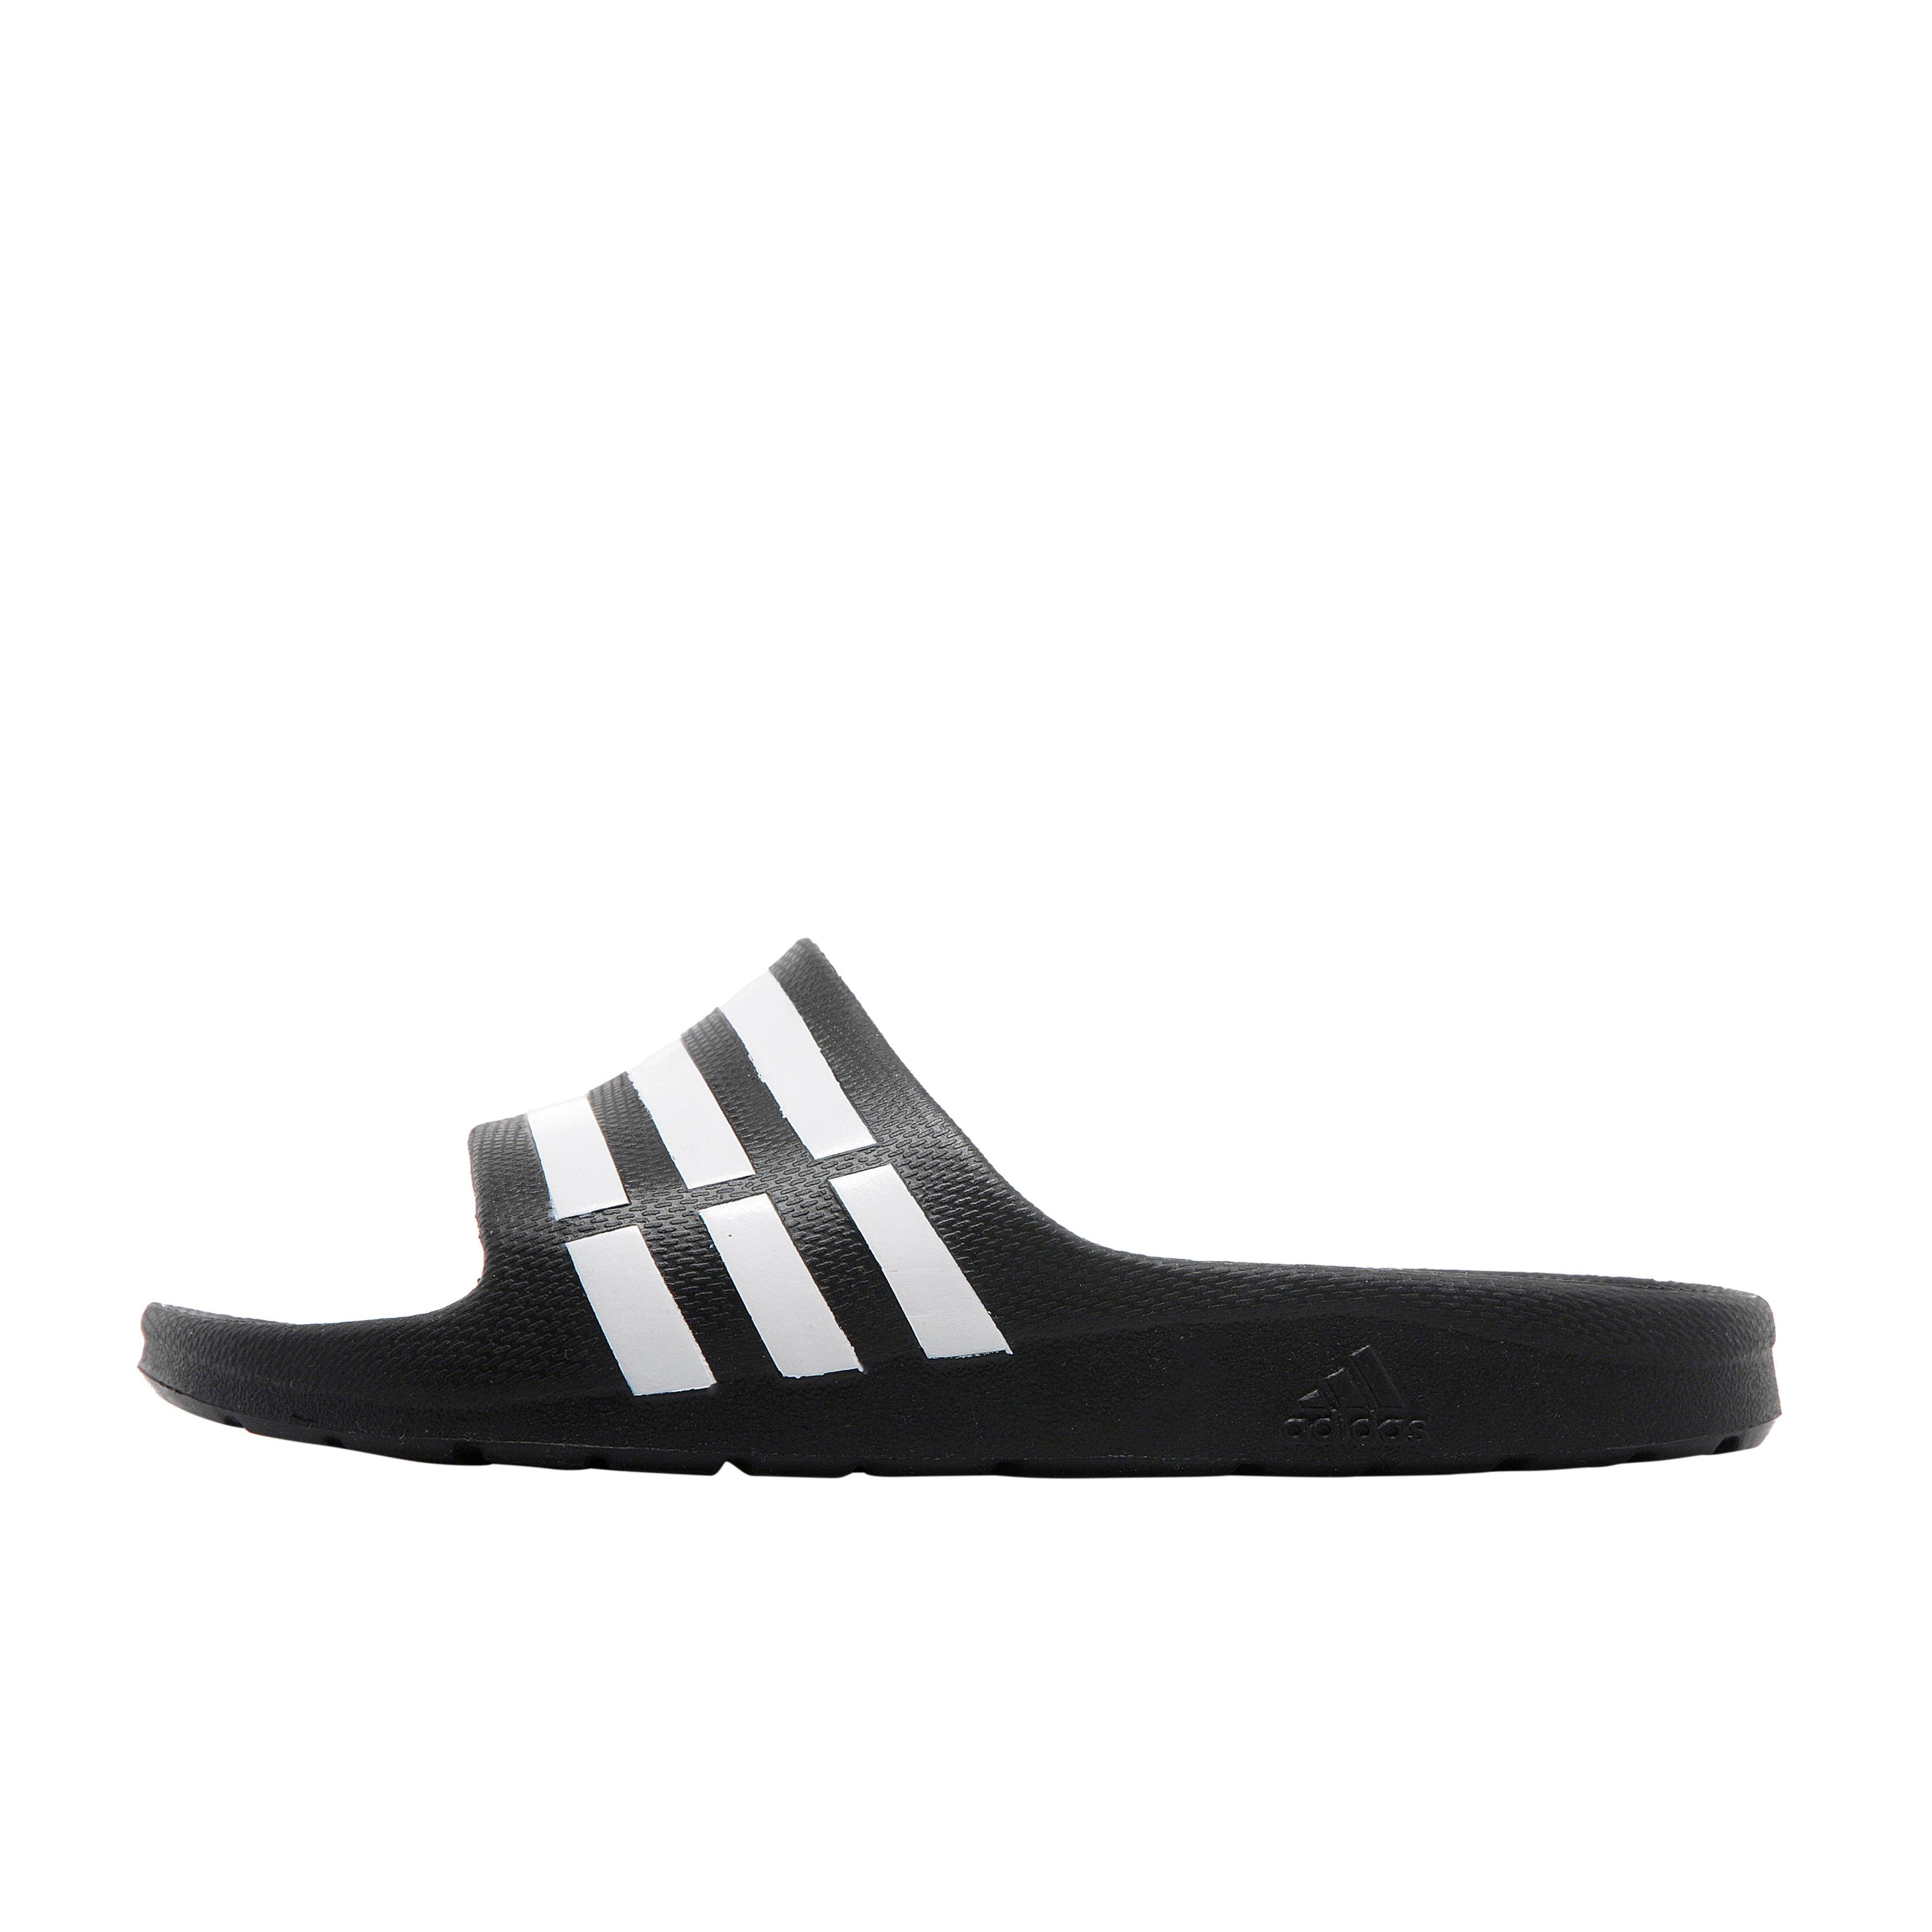 7d99d8ae760 Details about New adidas Duramo Slide Junior Sandals Slippers Flip Flops